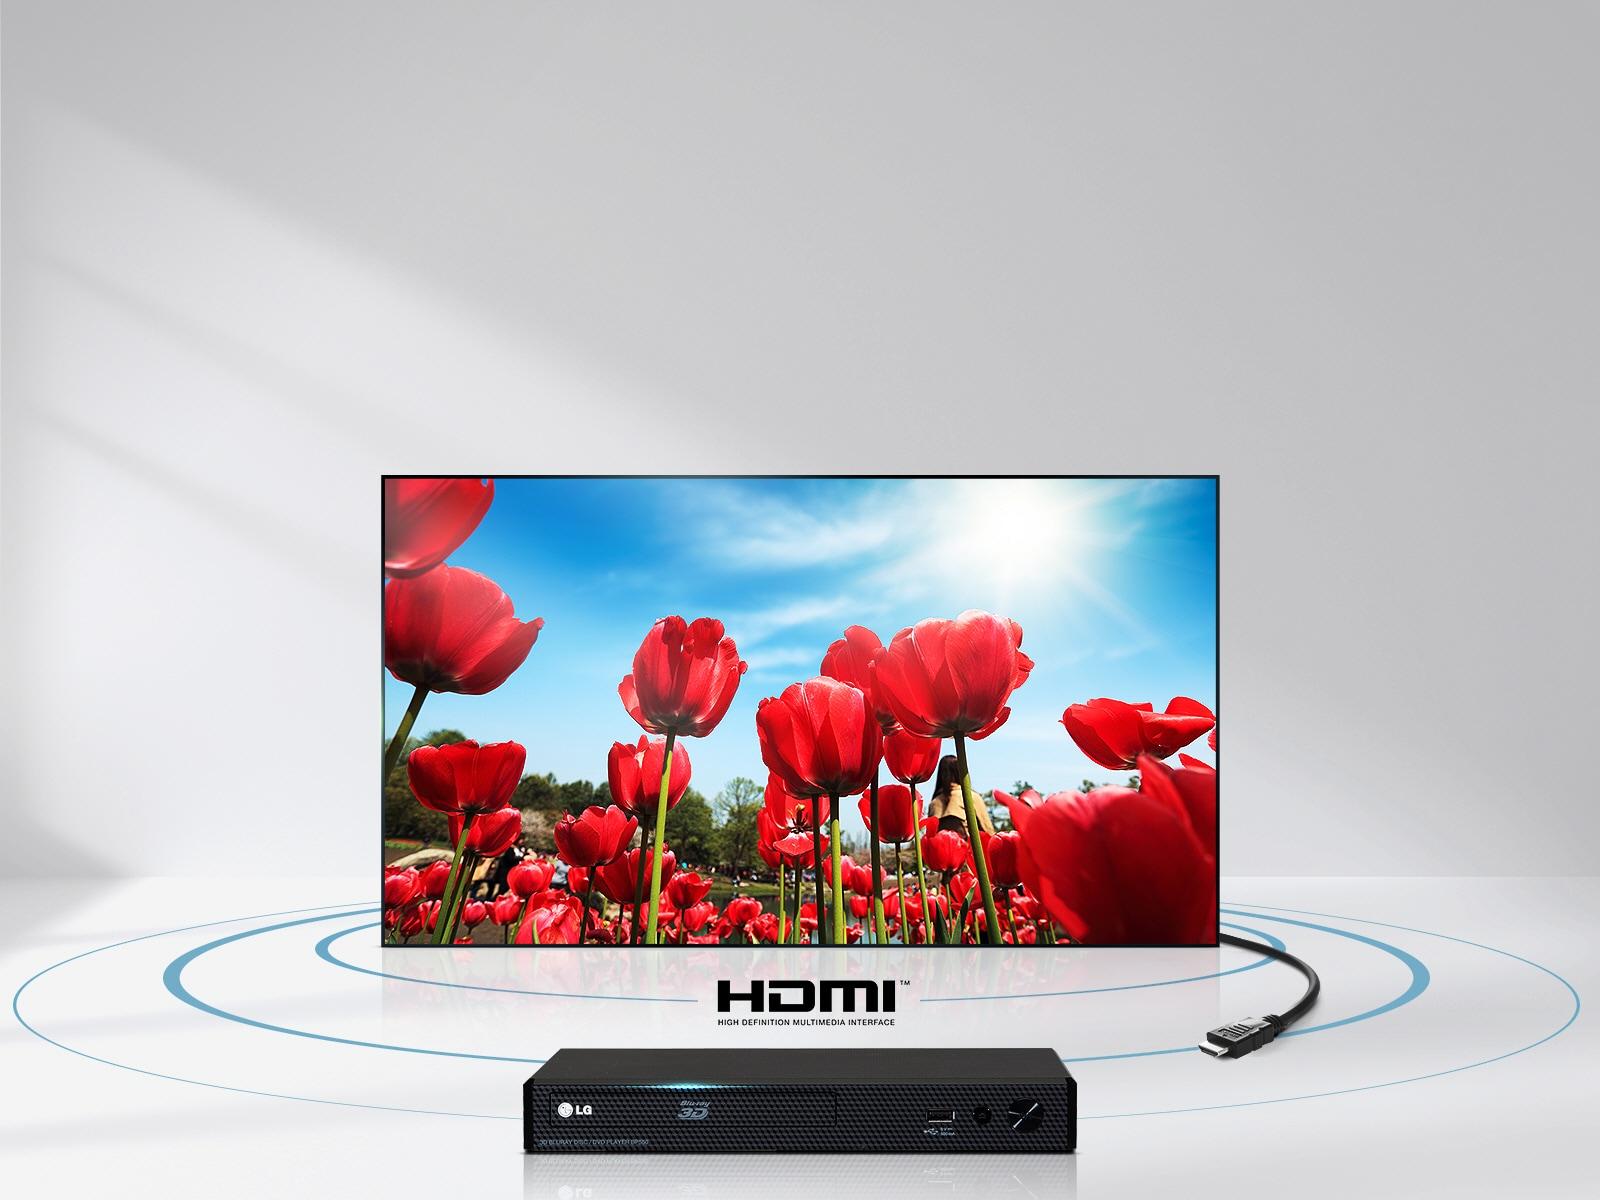 06_49_43LJ51_D_HDMI